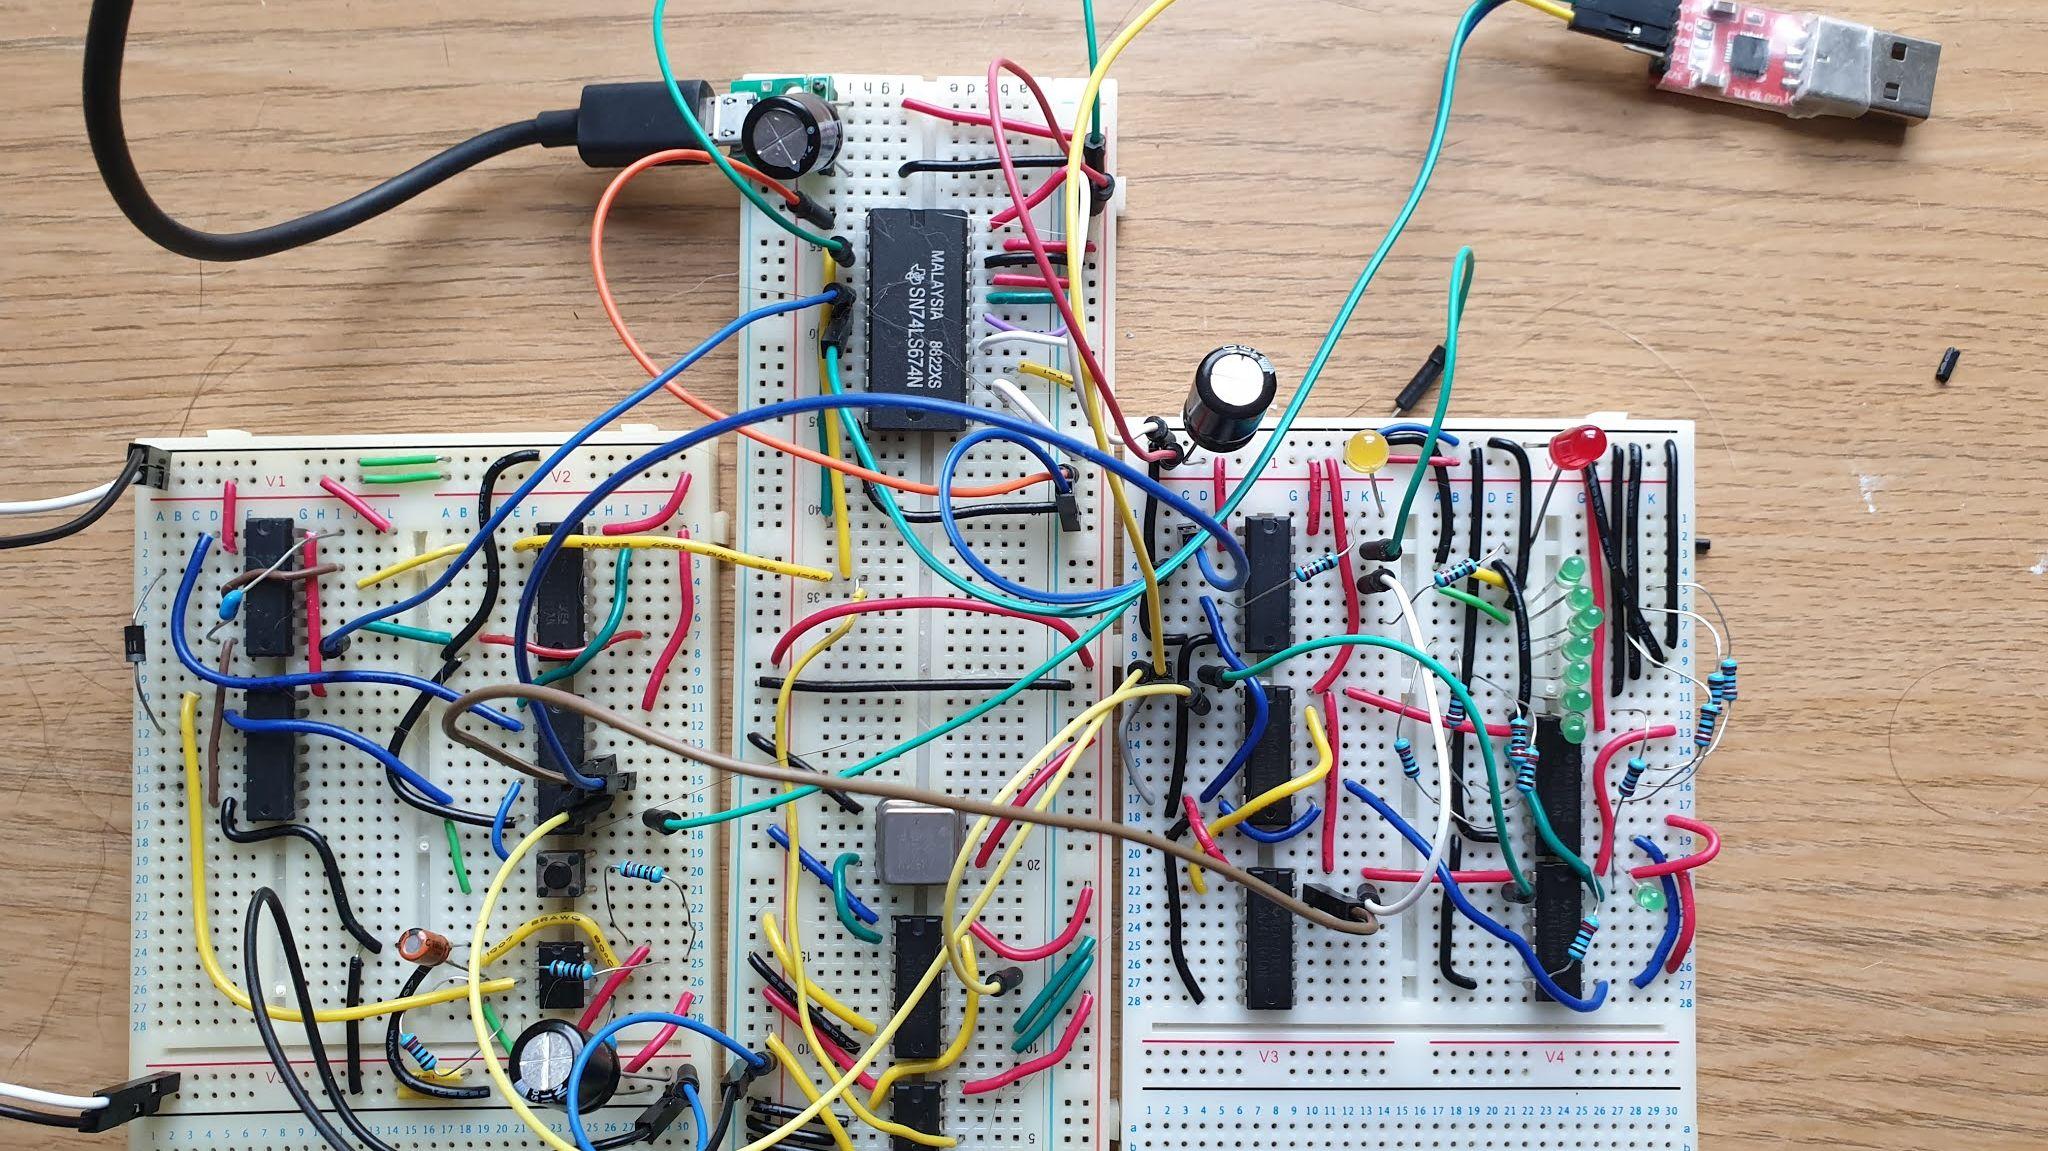 Discrete-Logic UART Keeps 8-Bit TTL Computer Connected